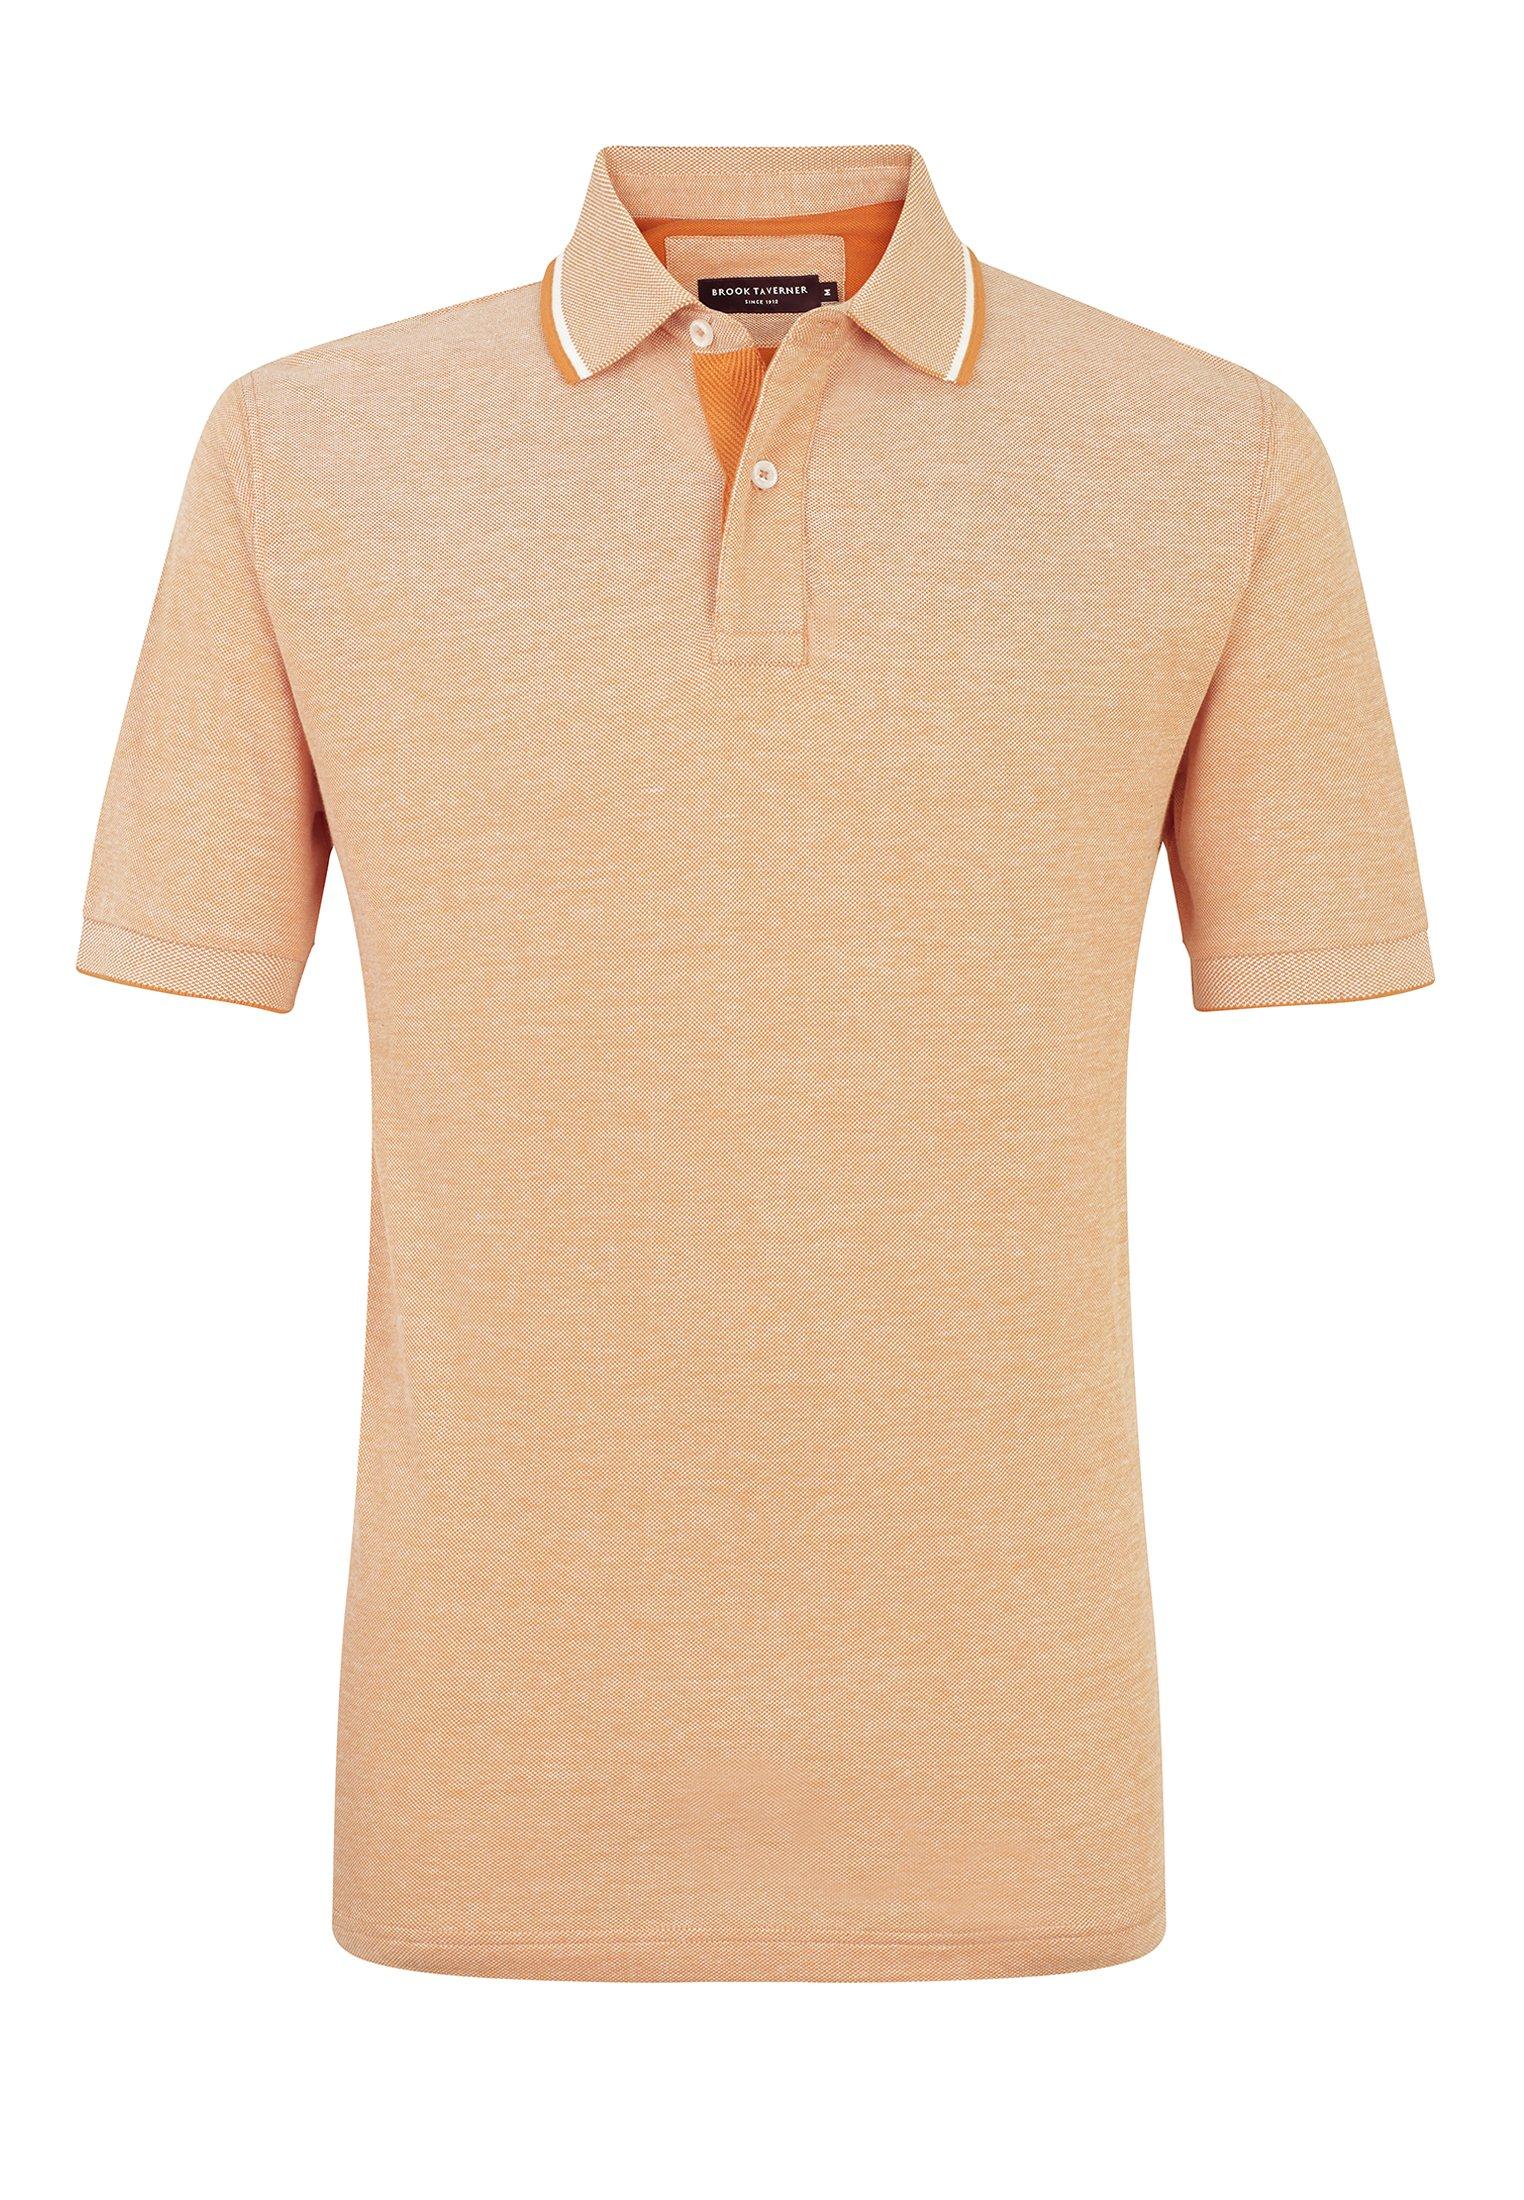 Image of Apricot Menston 100% Cotton Pique Polo Shirt